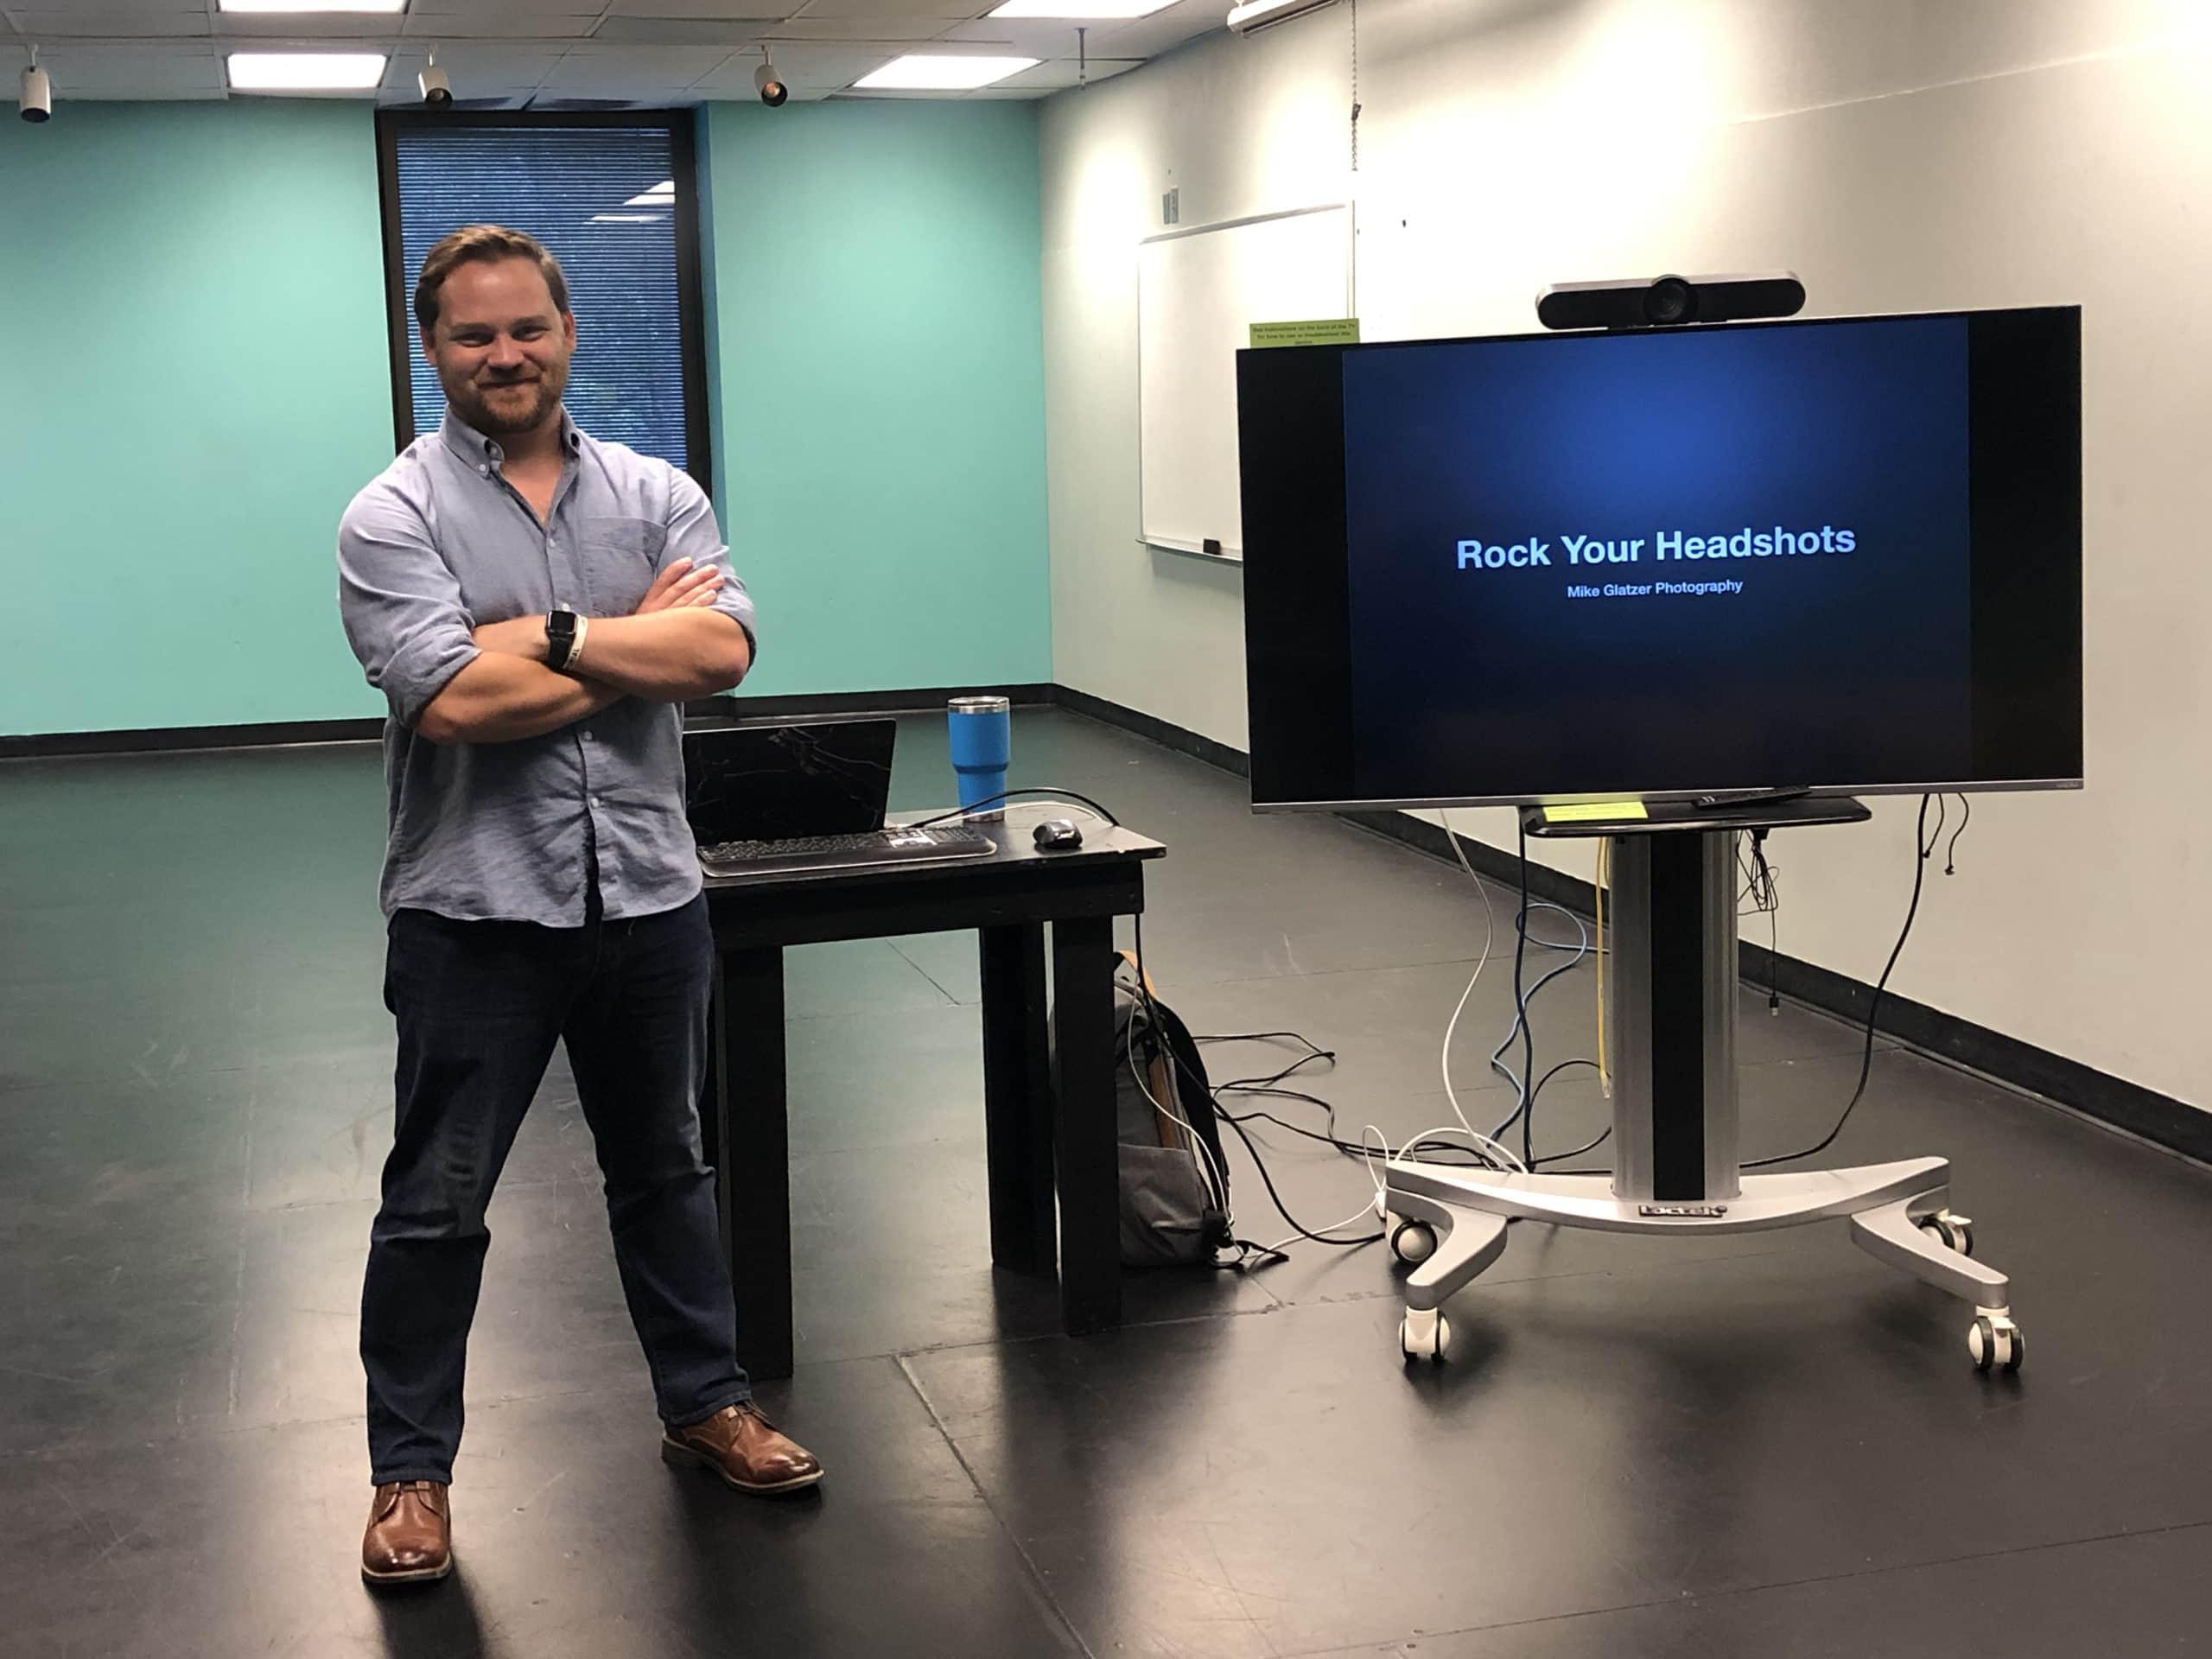 speaking topics by Mike Glatzer